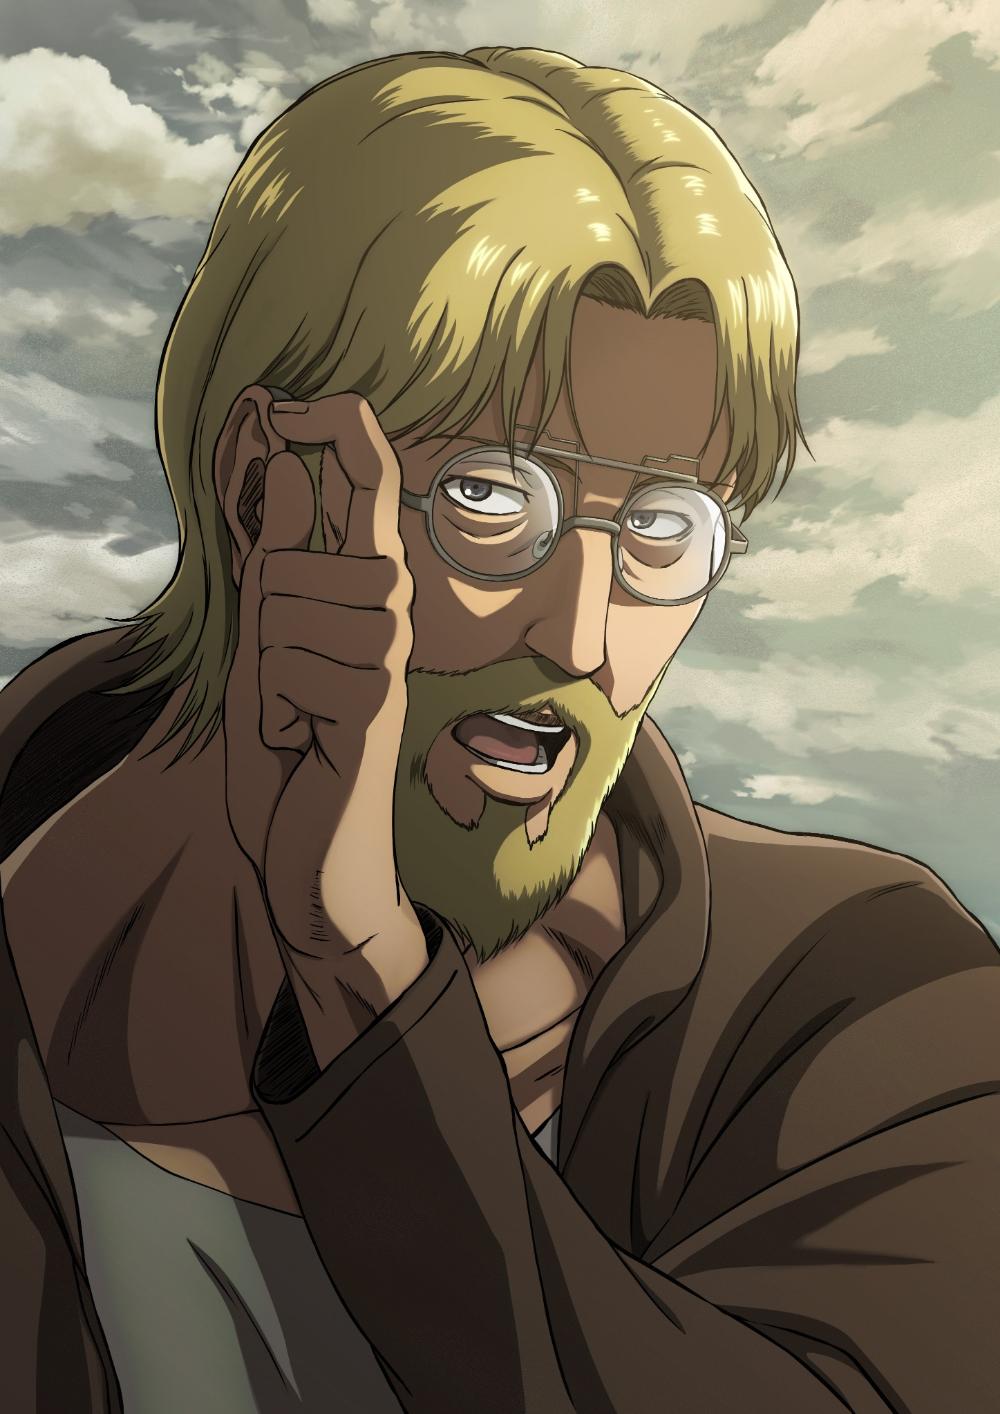 Pin de MYL en Attack on titan / 进击的巨人 Shingeky, Kyojin